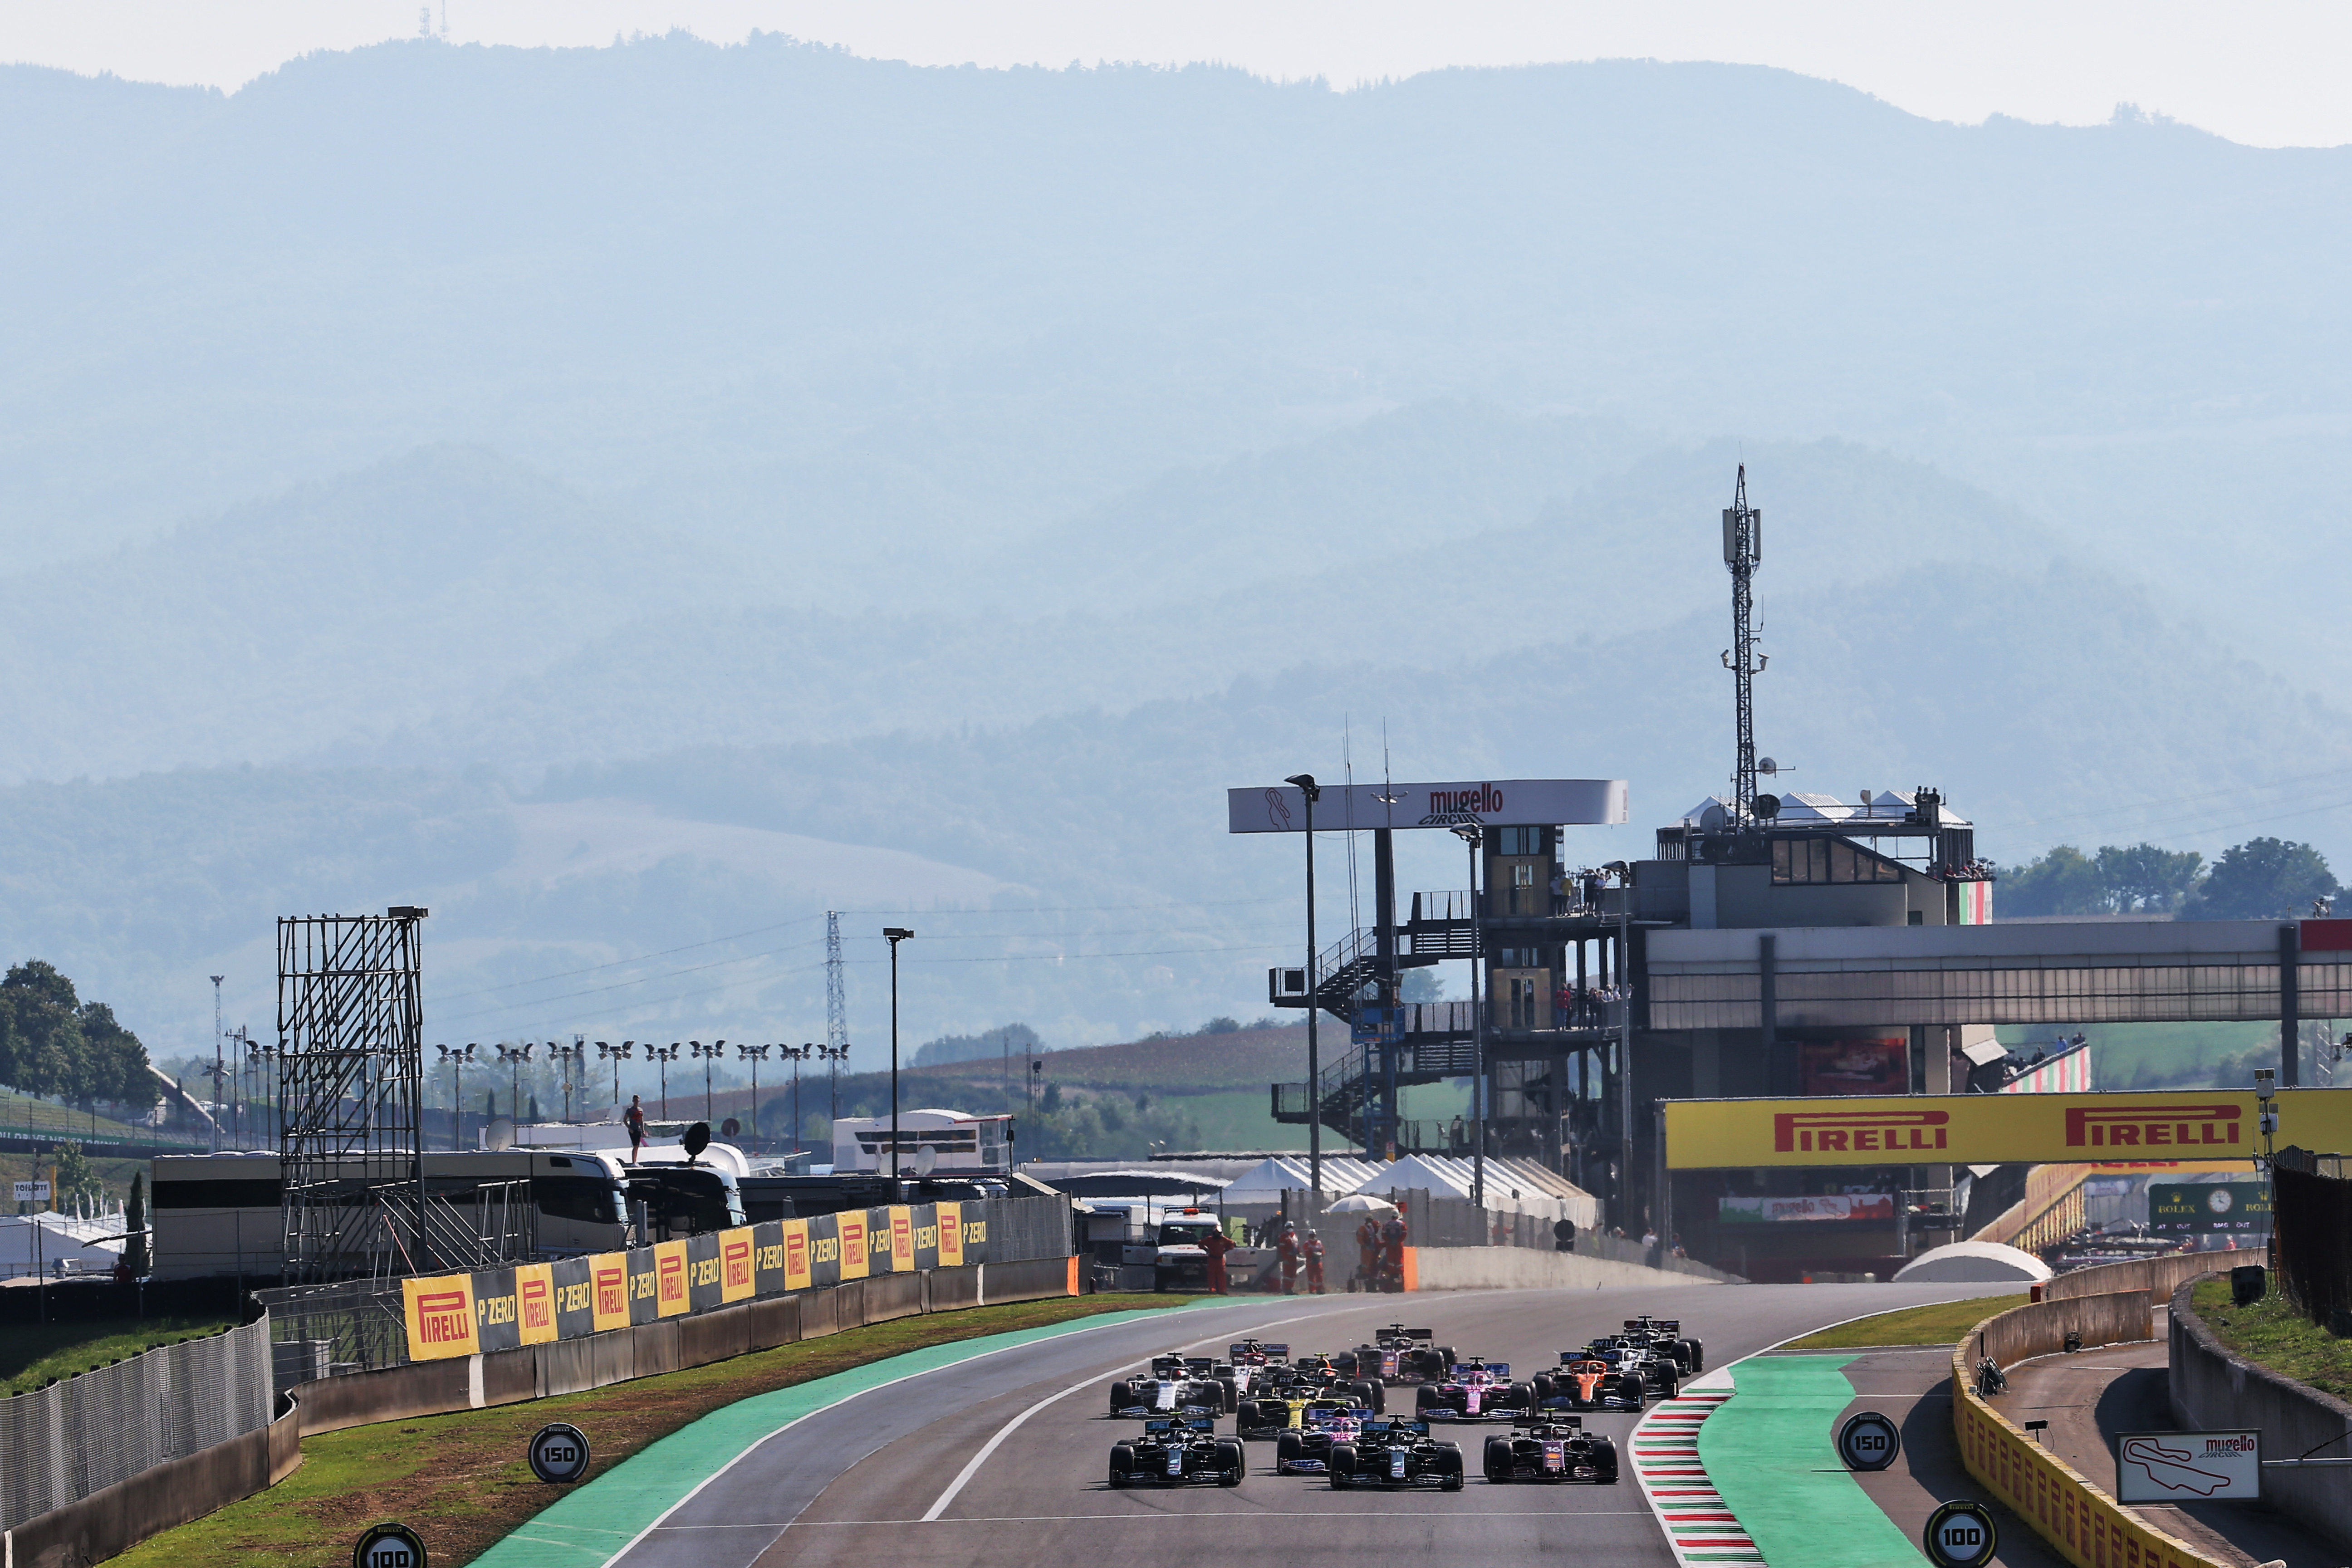 Tuscan Grand Prix Mugello